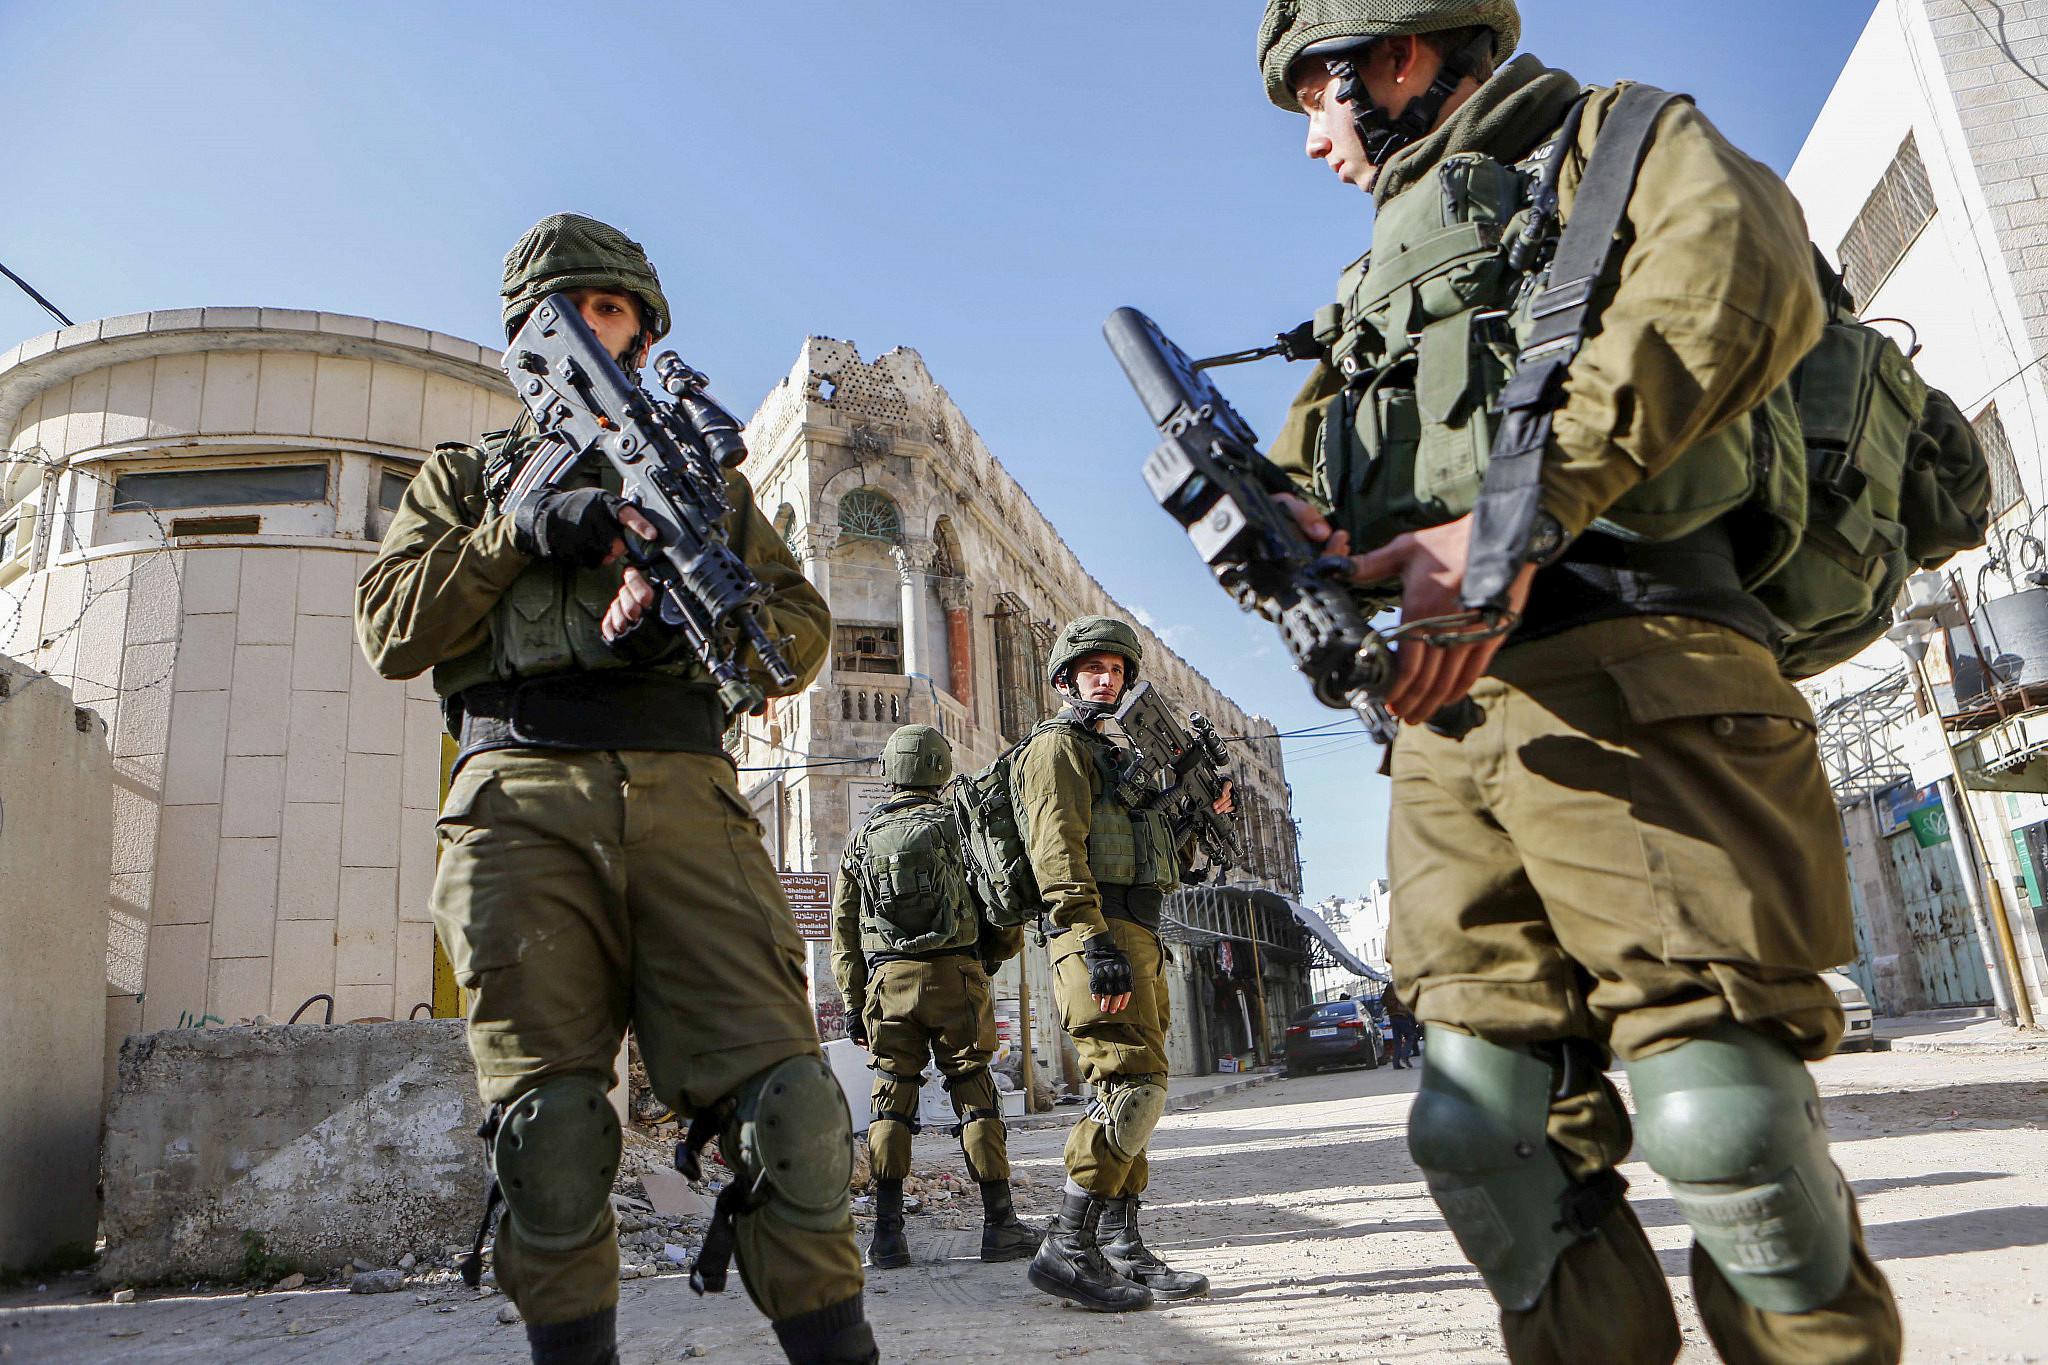 Israeli soldiers patrol the Old City of Hebron in the West Bank, Jan. 14, 2018. (Wisam Hashlamoun/Flash90)